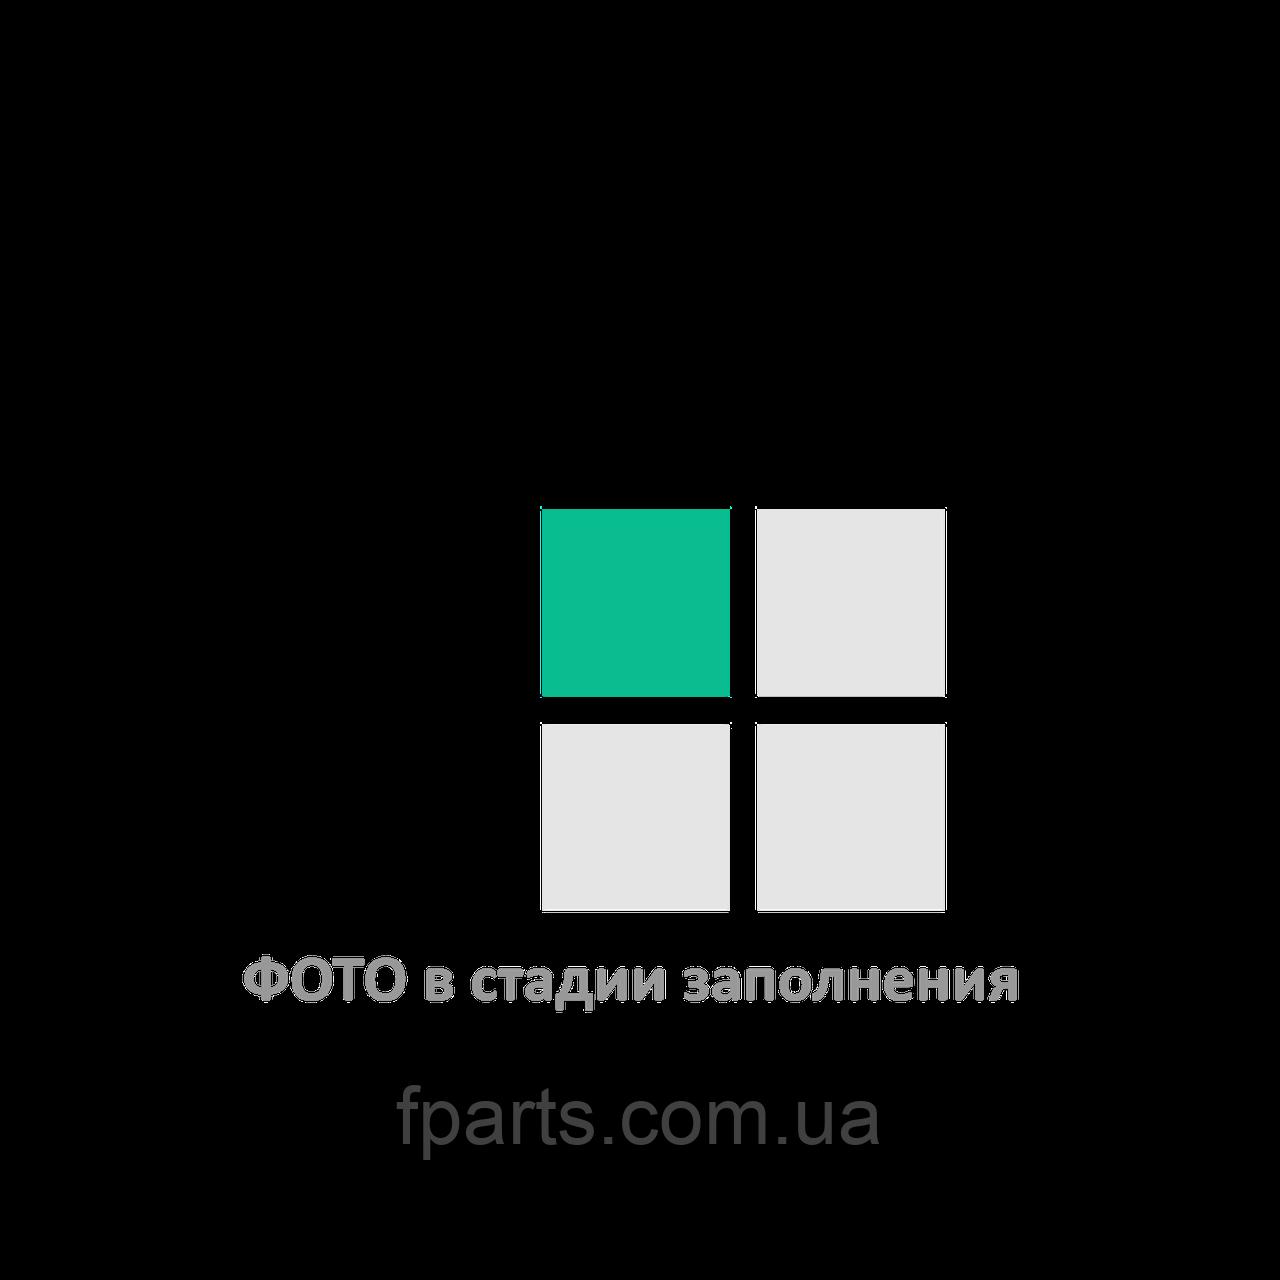 Дисплей LG P930 Nitro HD